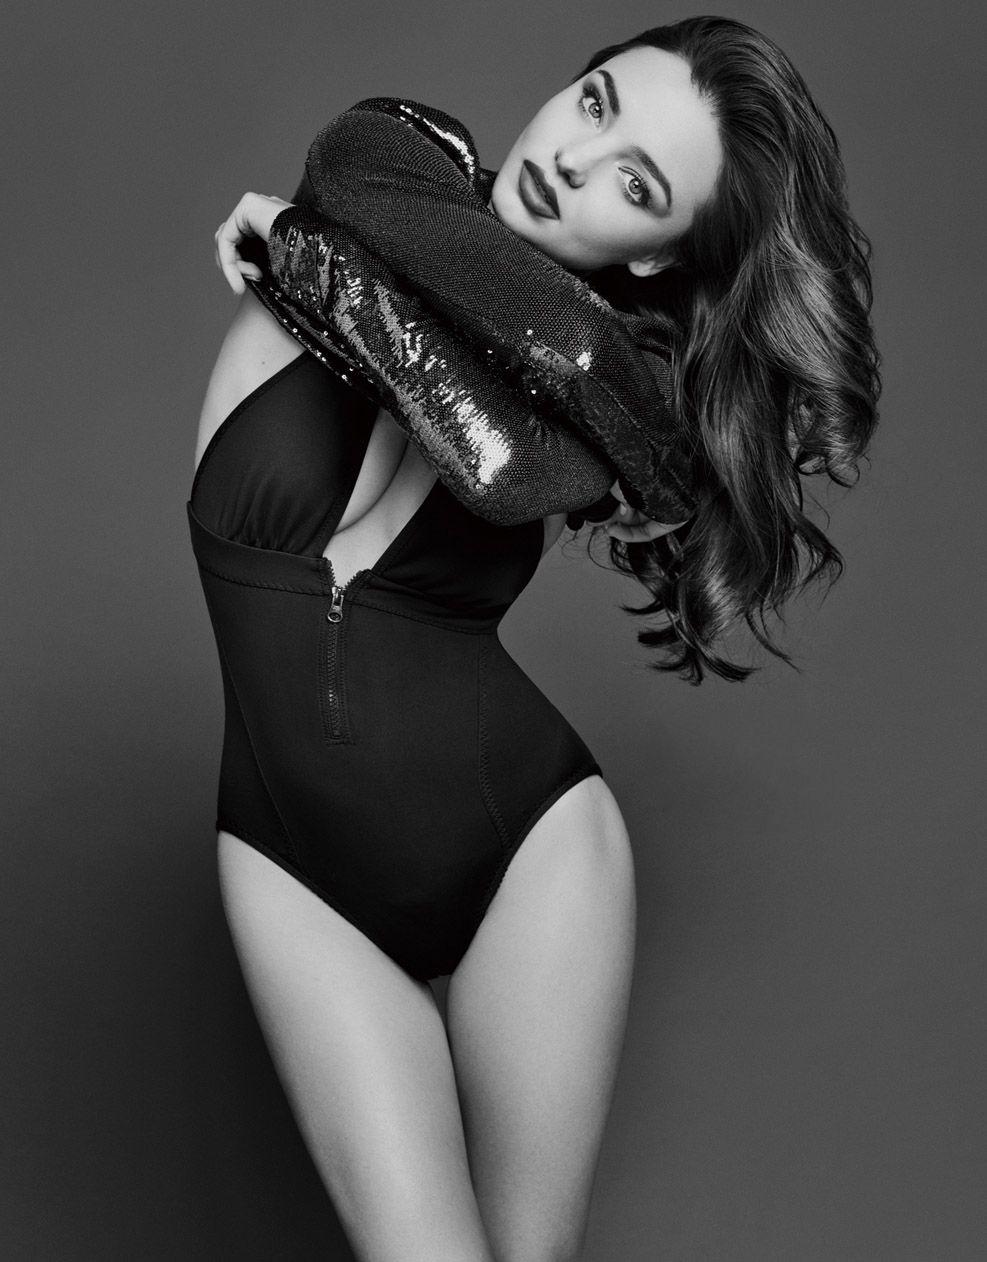 Sexy Pics Of Miranda Kerr